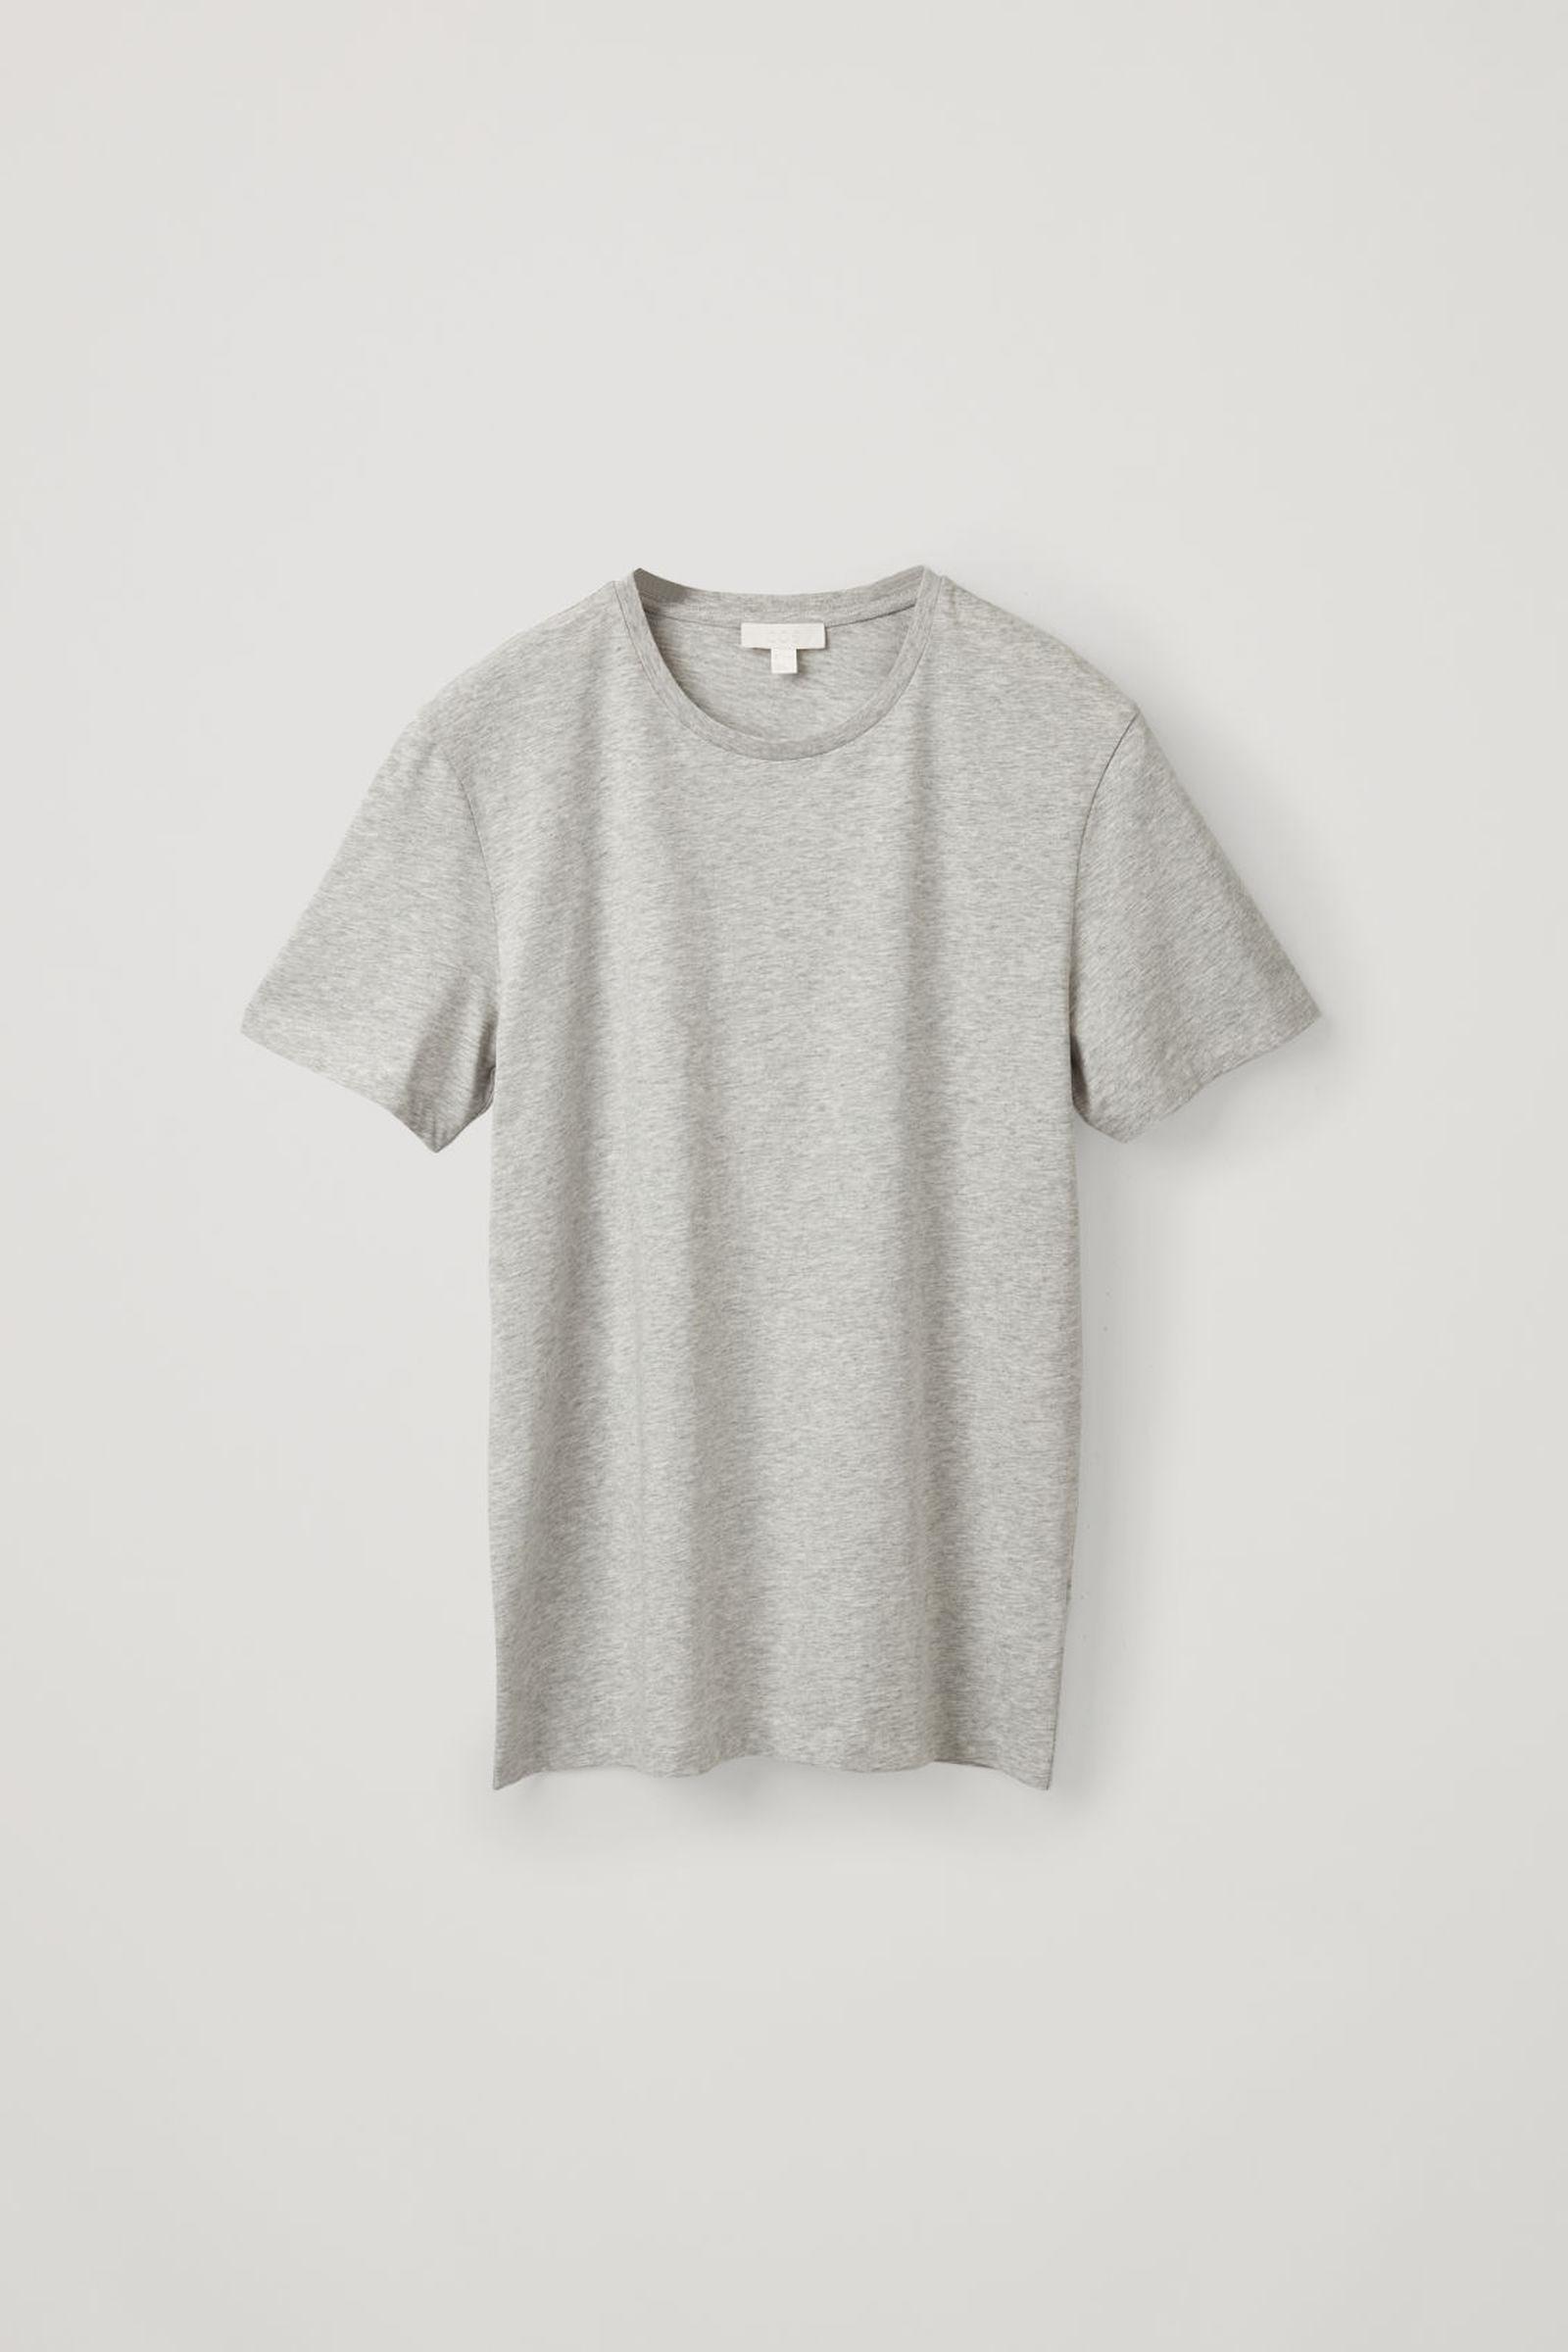 COS 라운드 넥 티셔츠의 라이트 그레이 멜란지컬러 Product입니다.